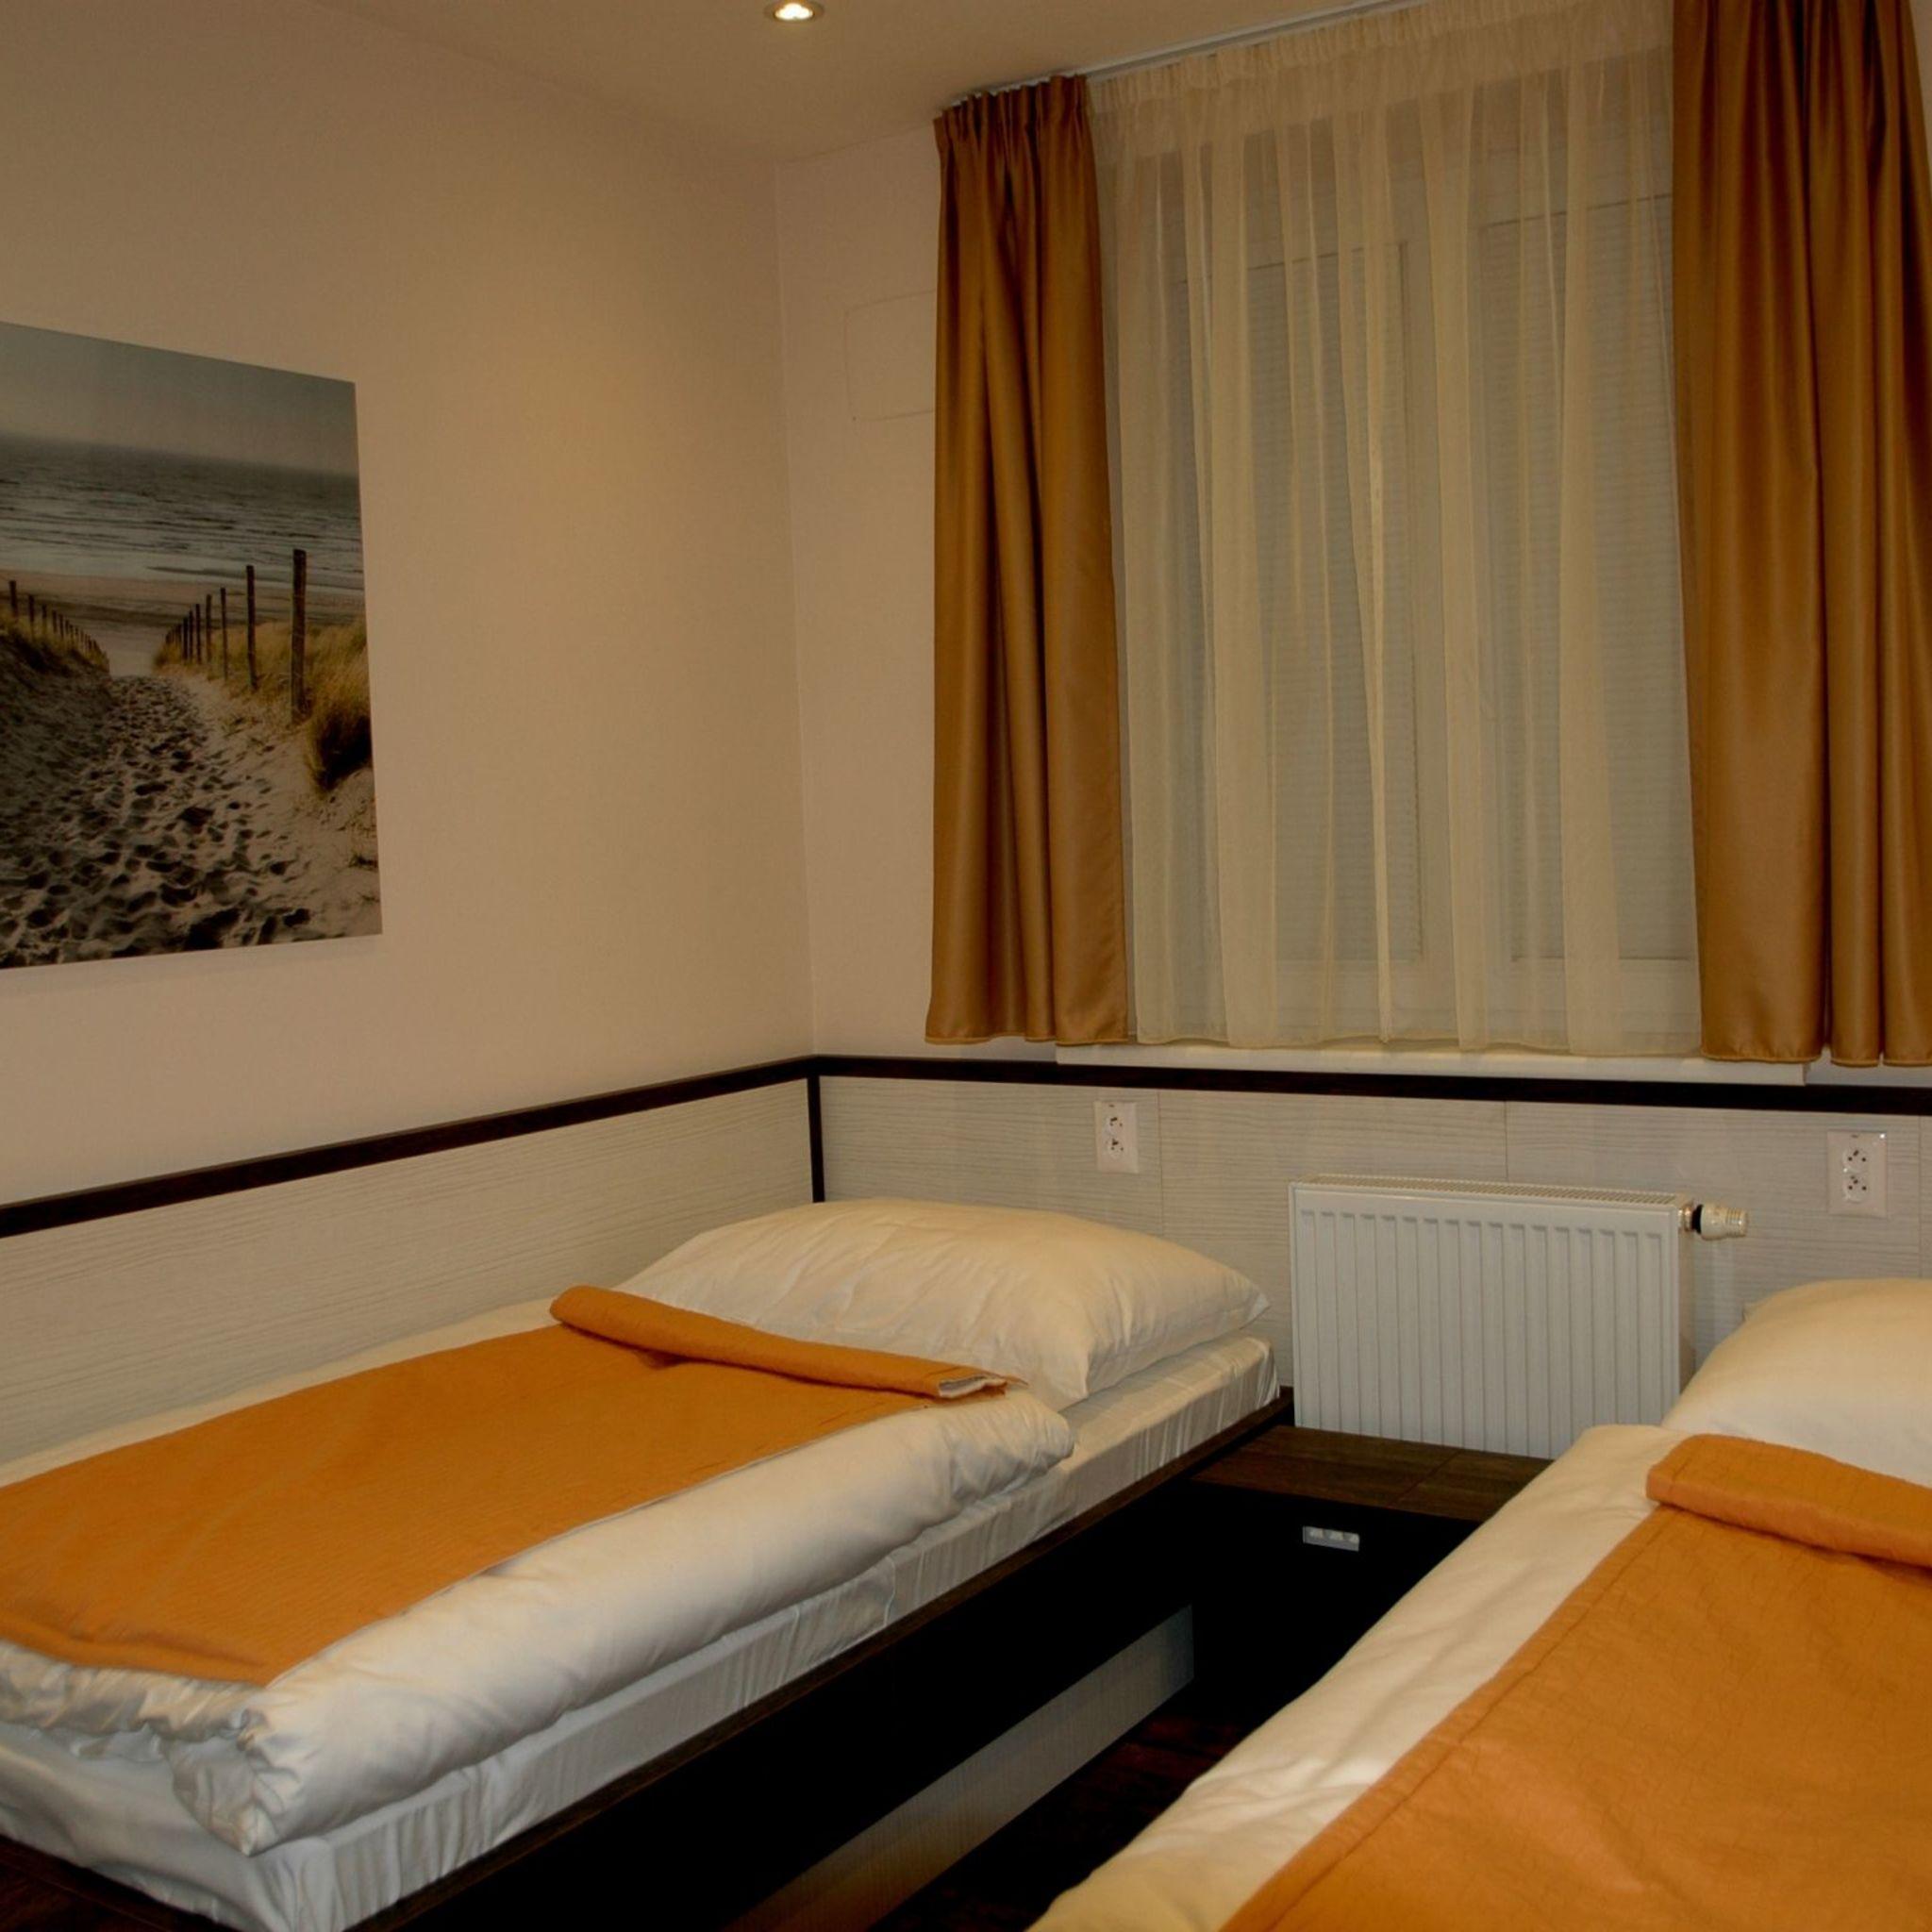 apartm ny viktor bratislava. Black Bedroom Furniture Sets. Home Design Ideas